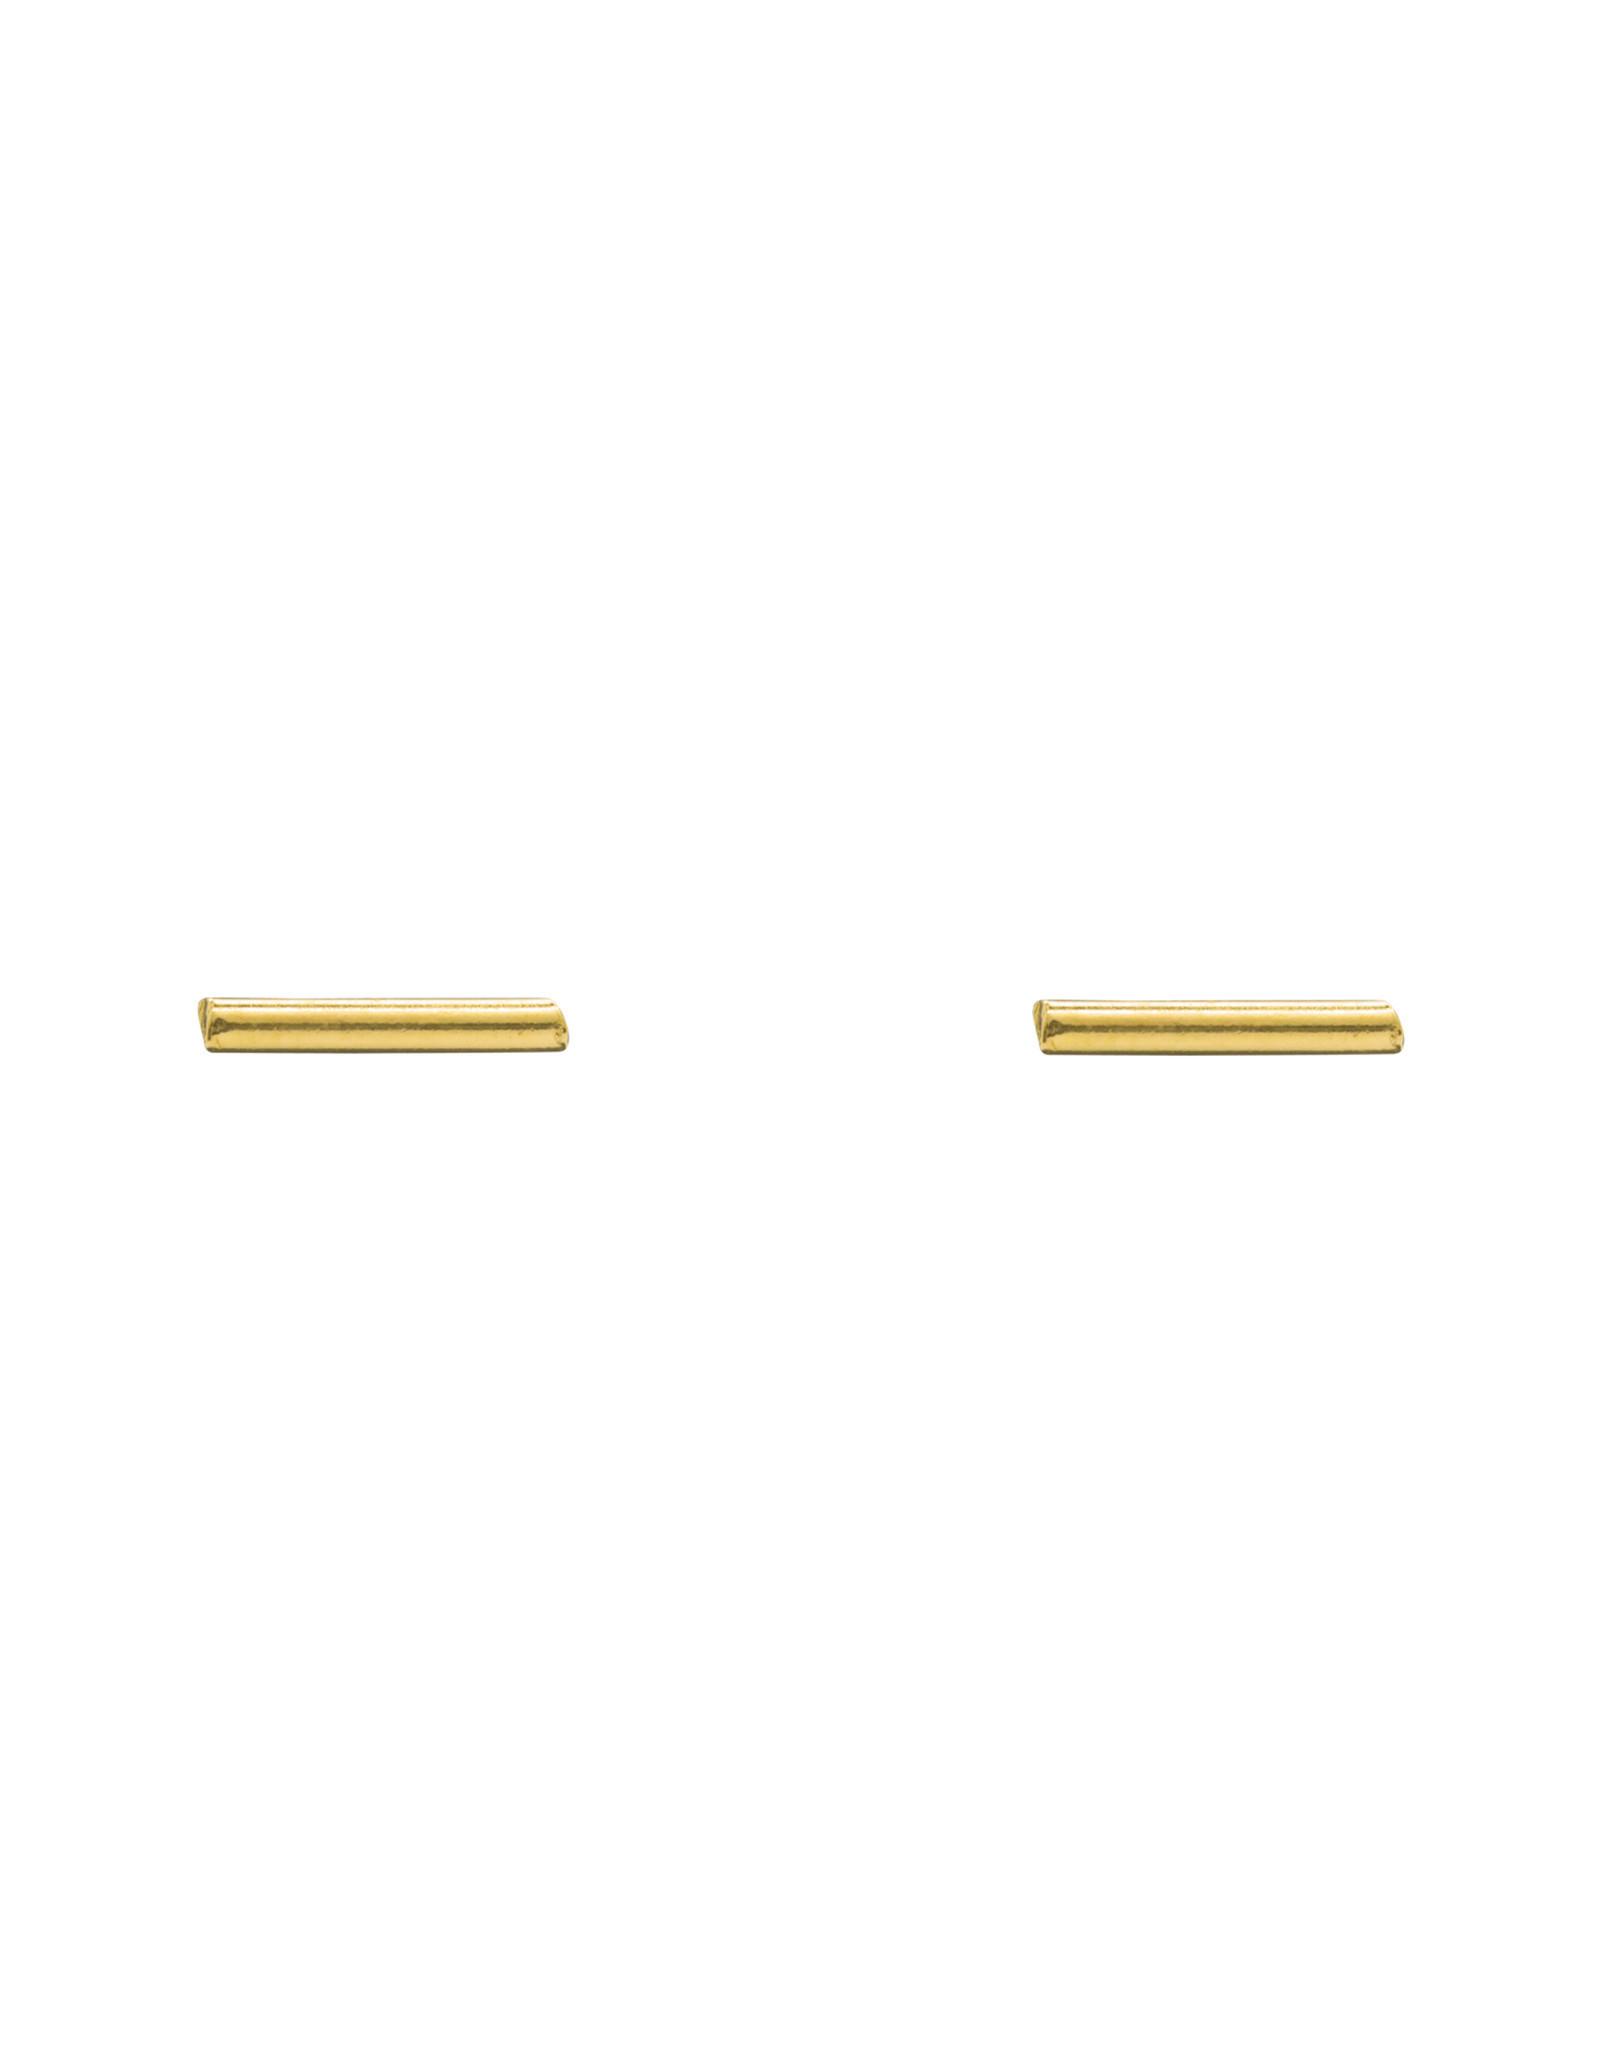 Flawed Bar earring studs gold